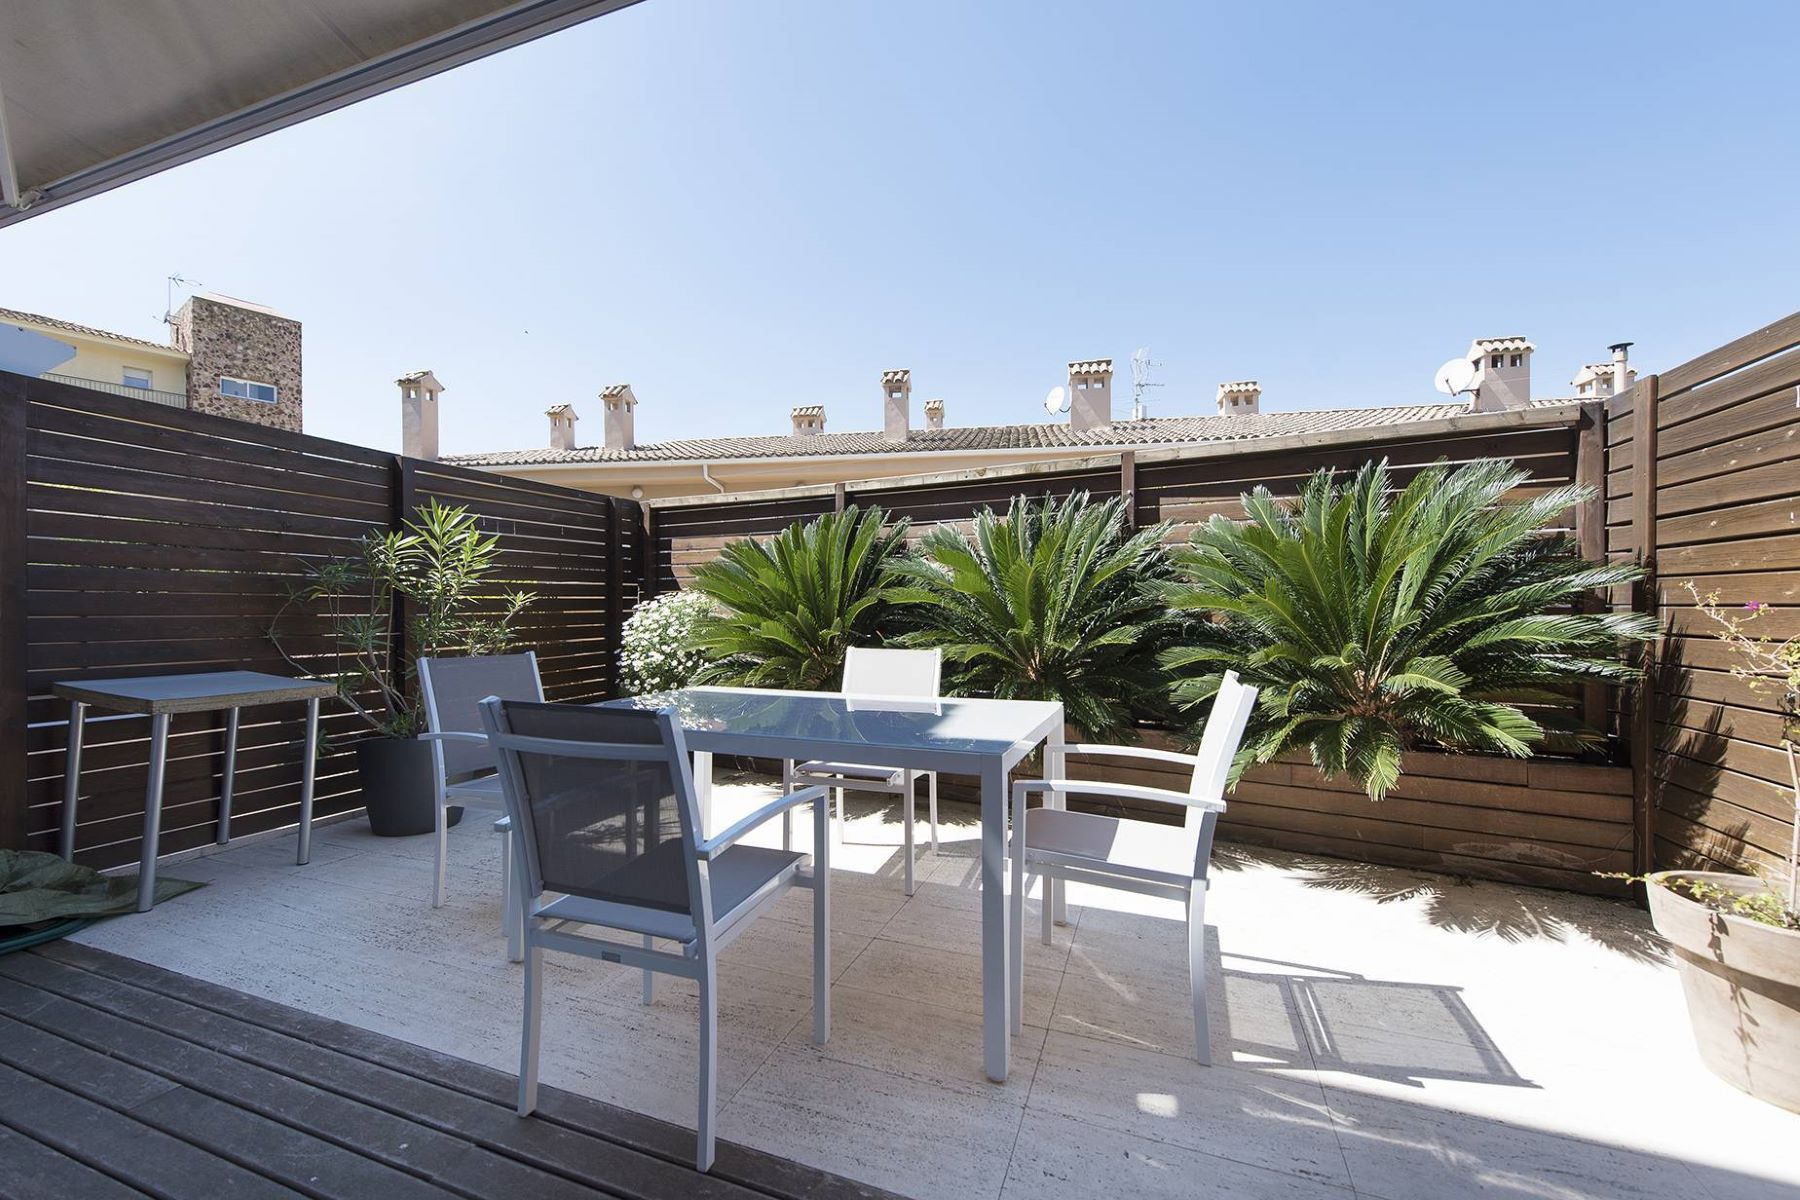 Tek Ailelik Ev için Satış at Lovely terraced house 600m from Sa Conca beach S'Agaro, Costa Brava, 17248 Ispanya